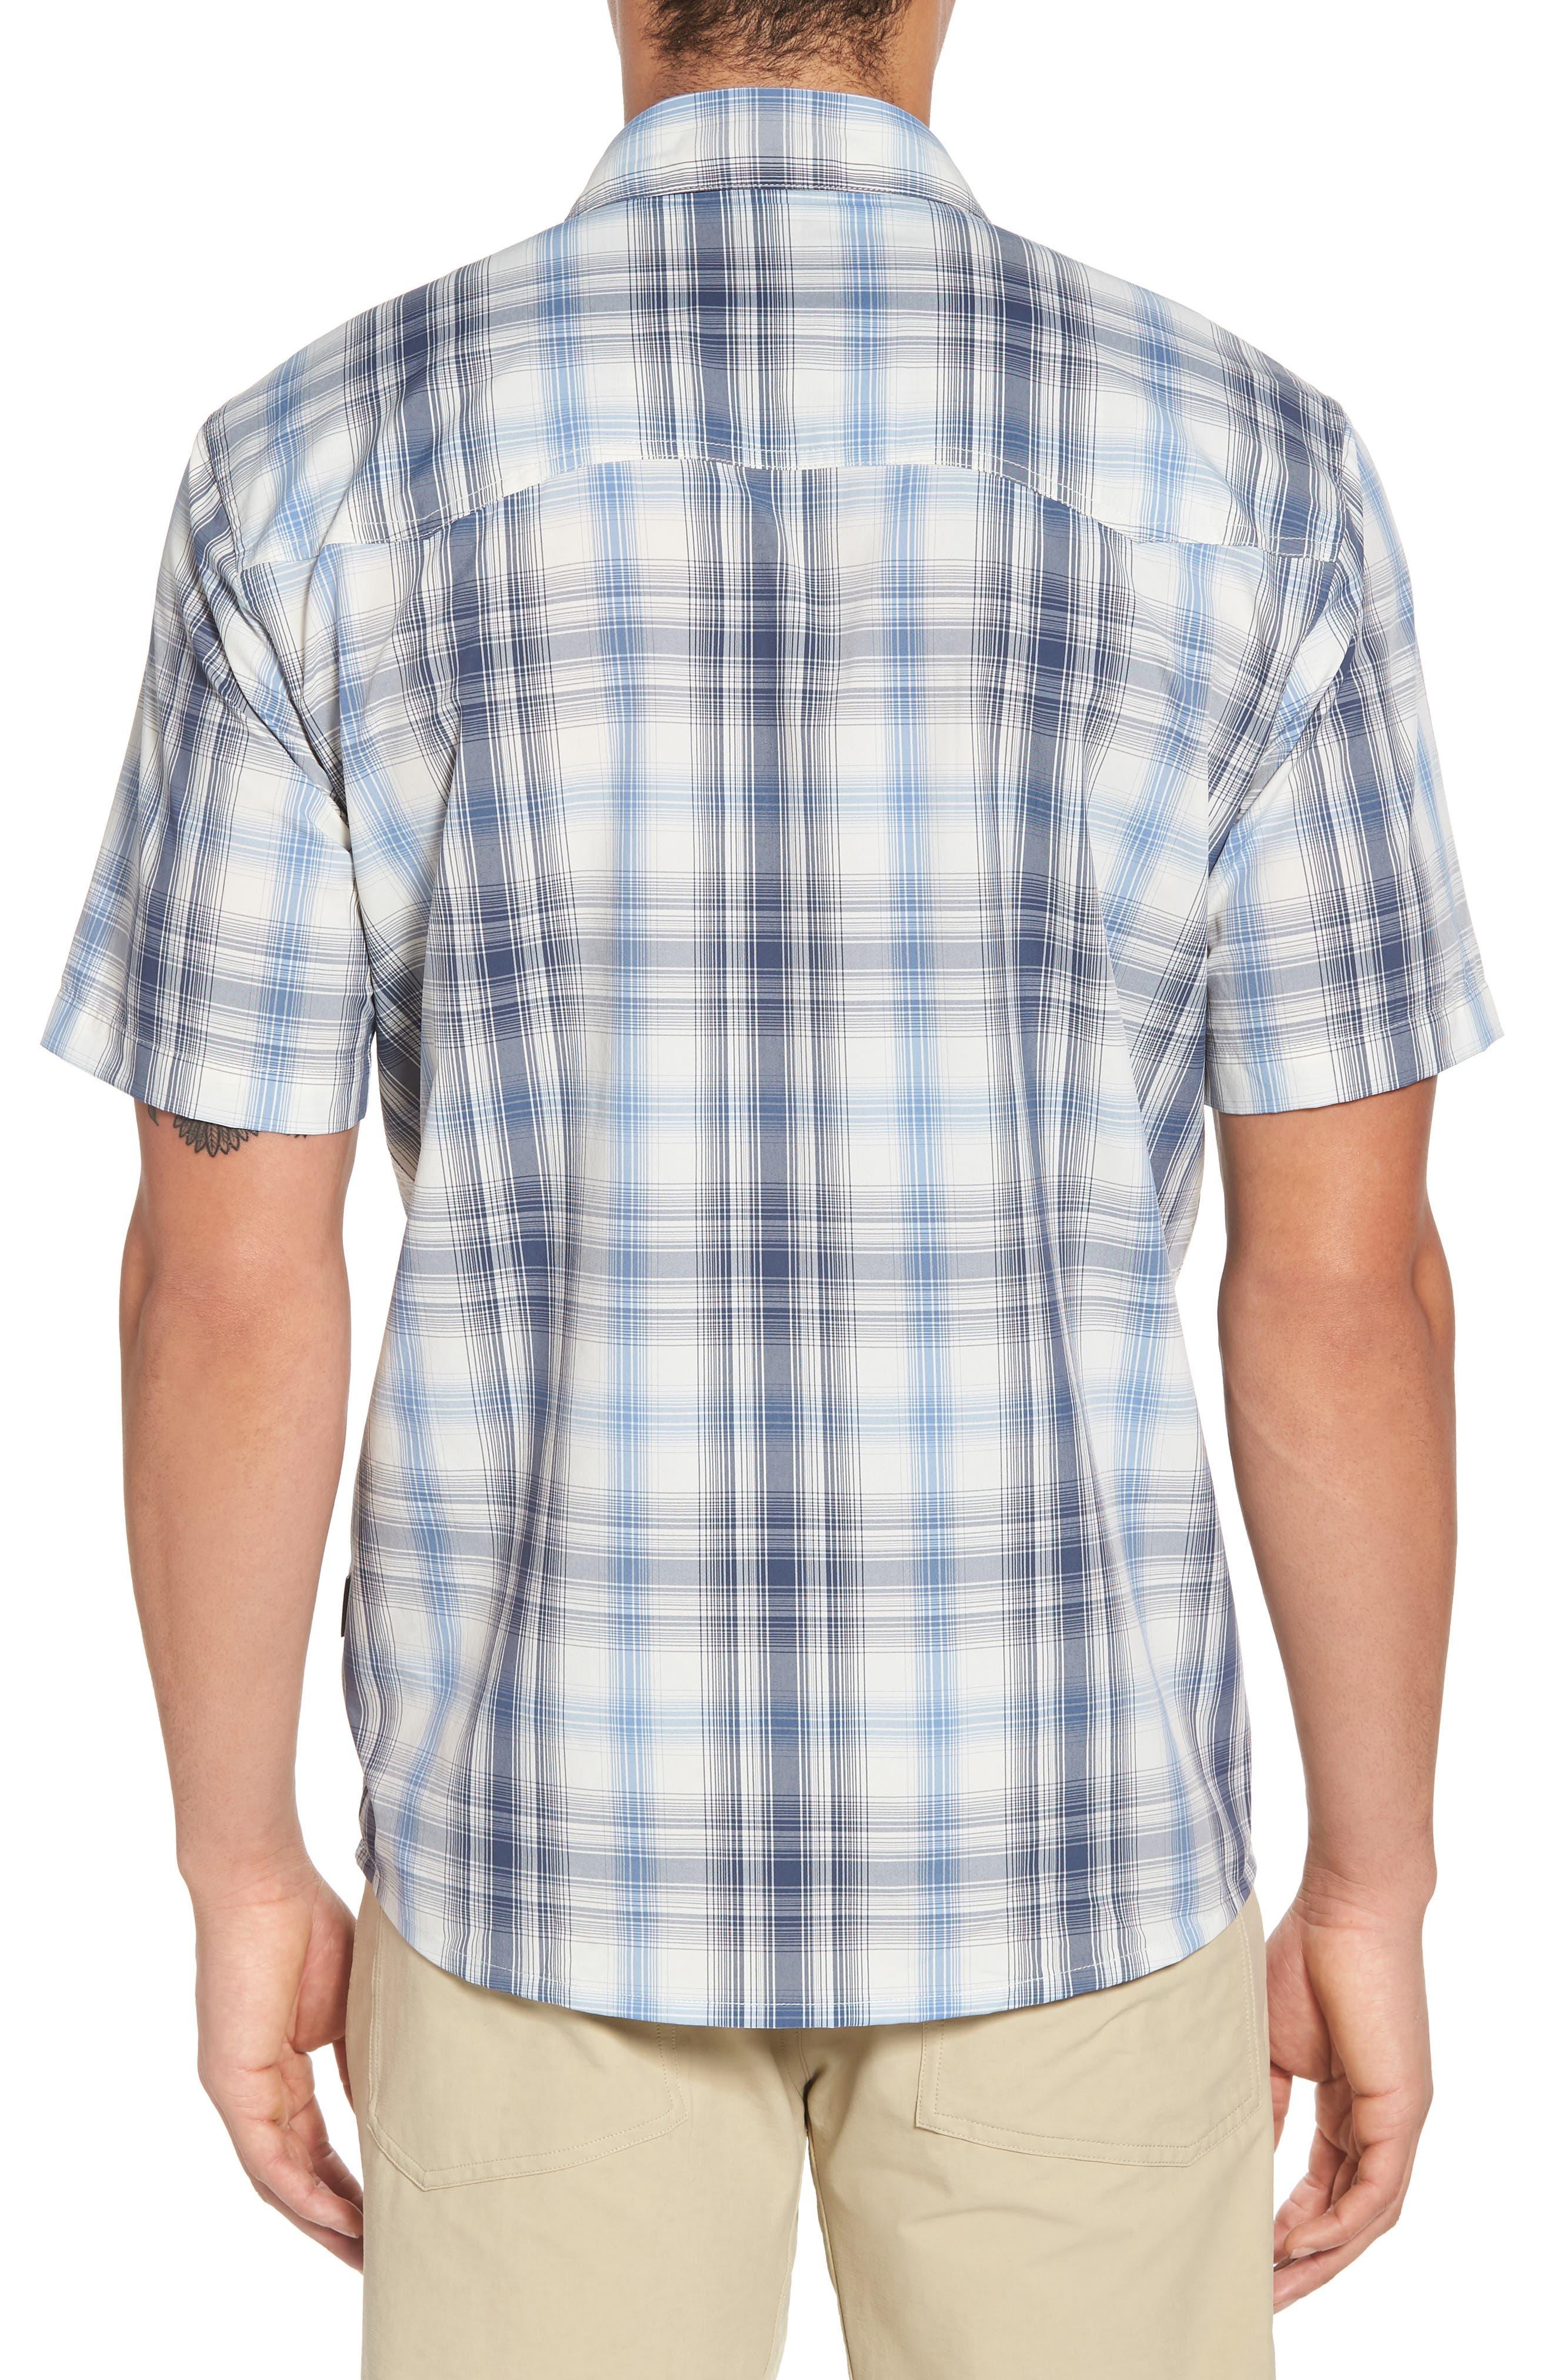 M's Sun Plaid Stretch Hybrid Shirt,                             Alternate thumbnail 2, color,                             KING SWING RADAR BLUE